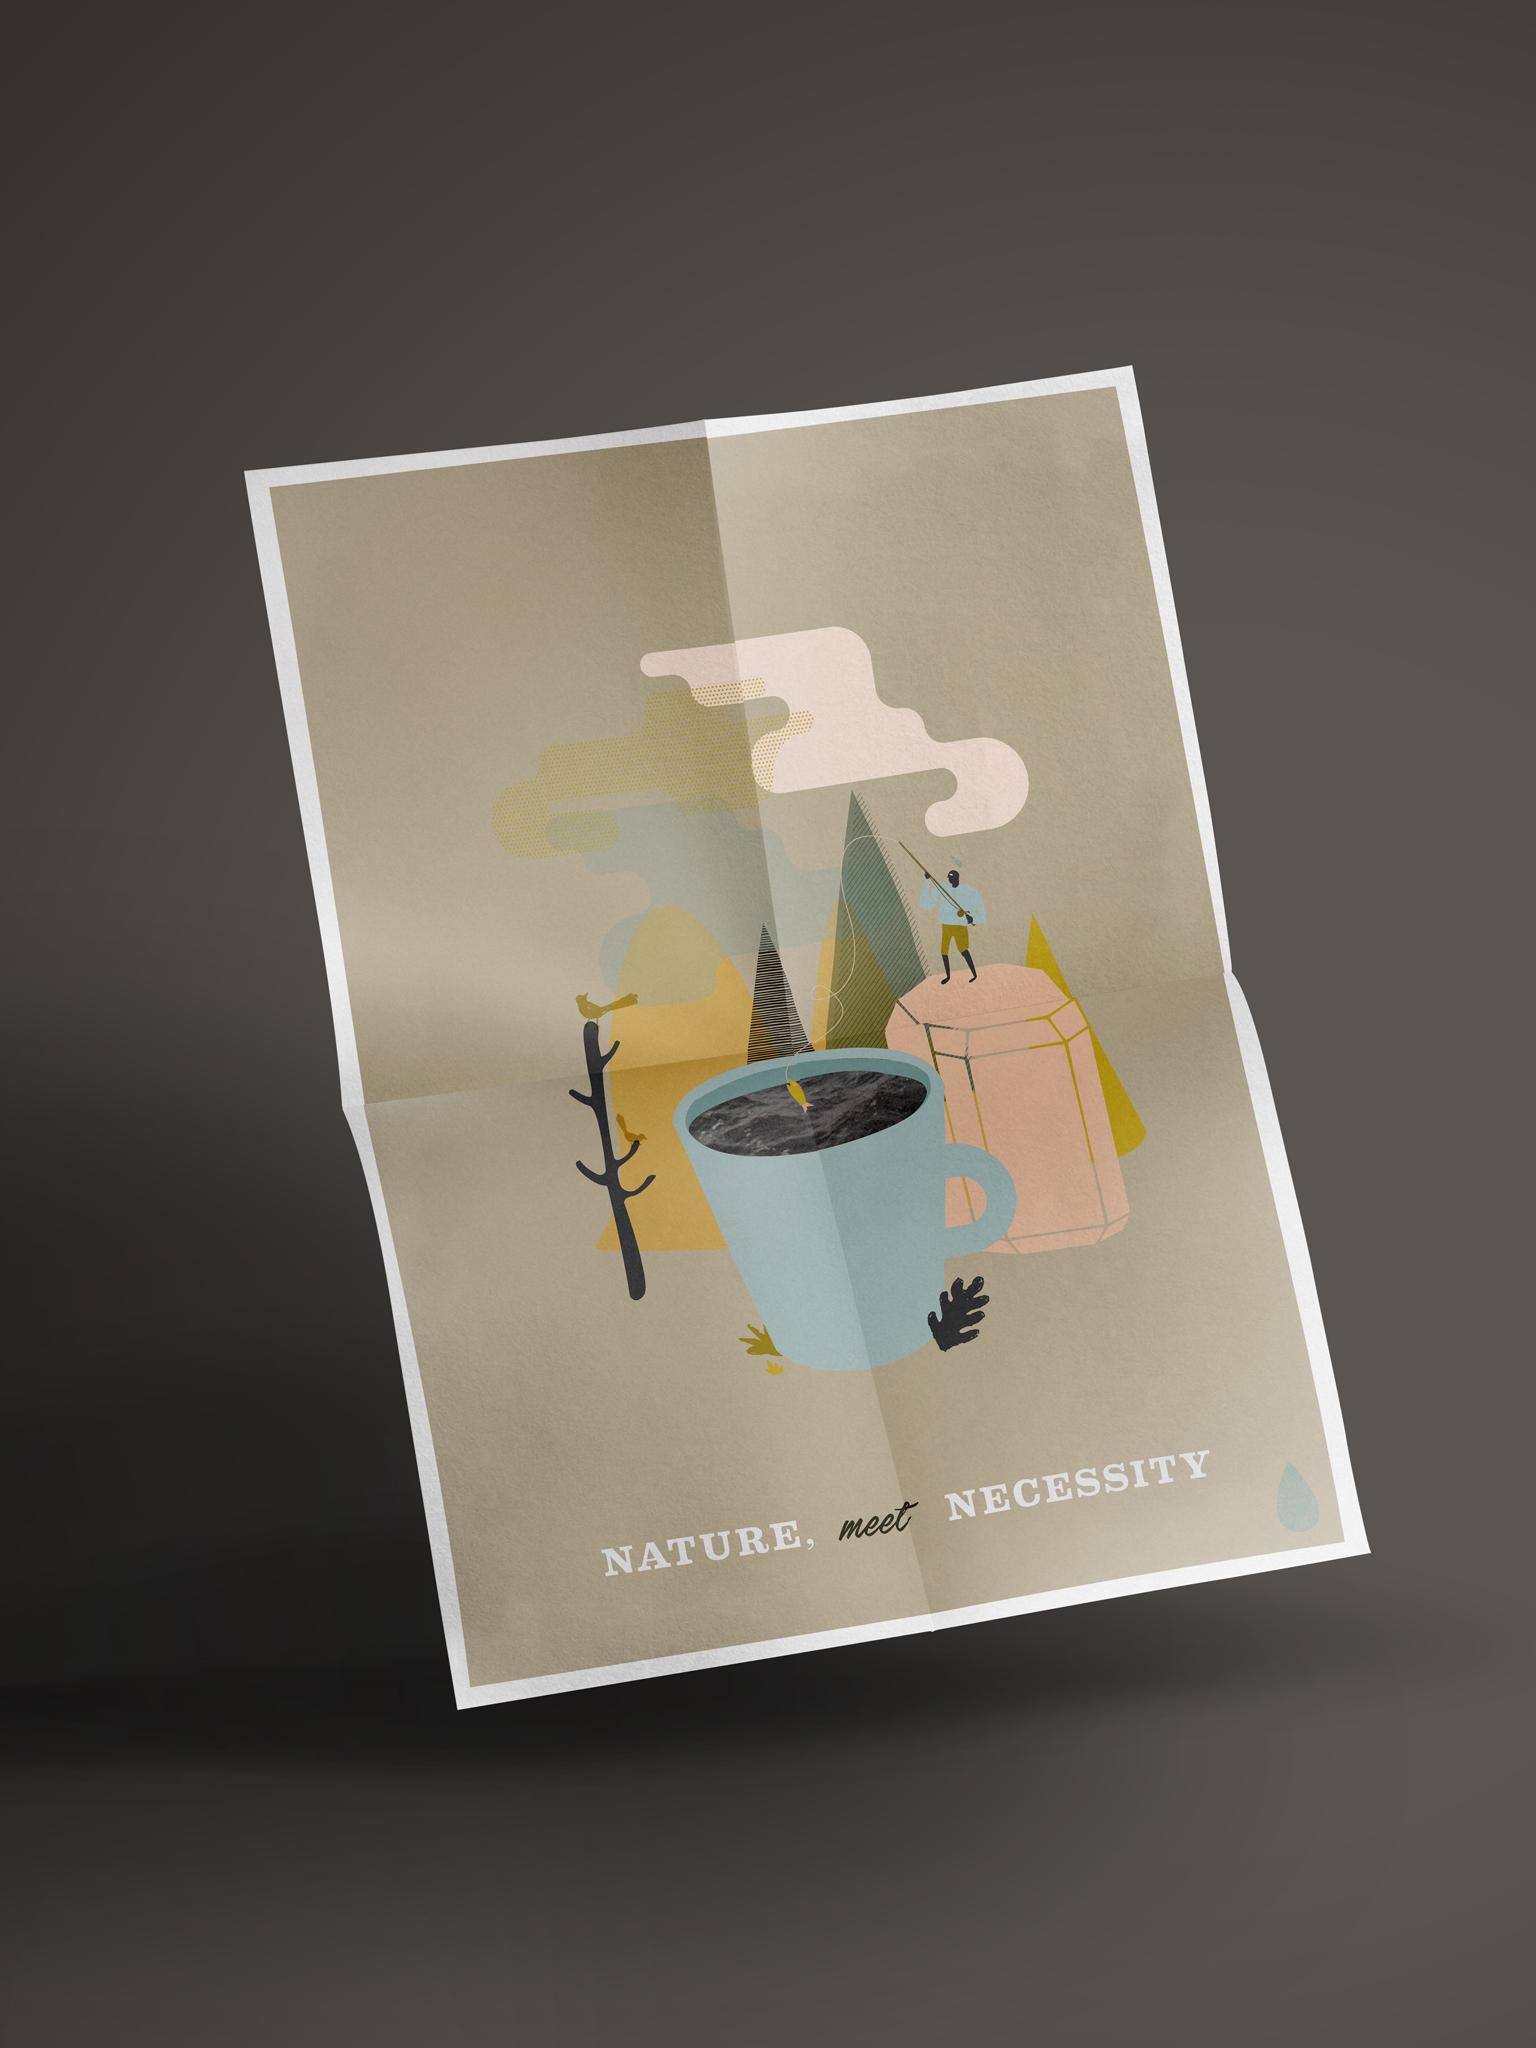 posterfront_02.jpg